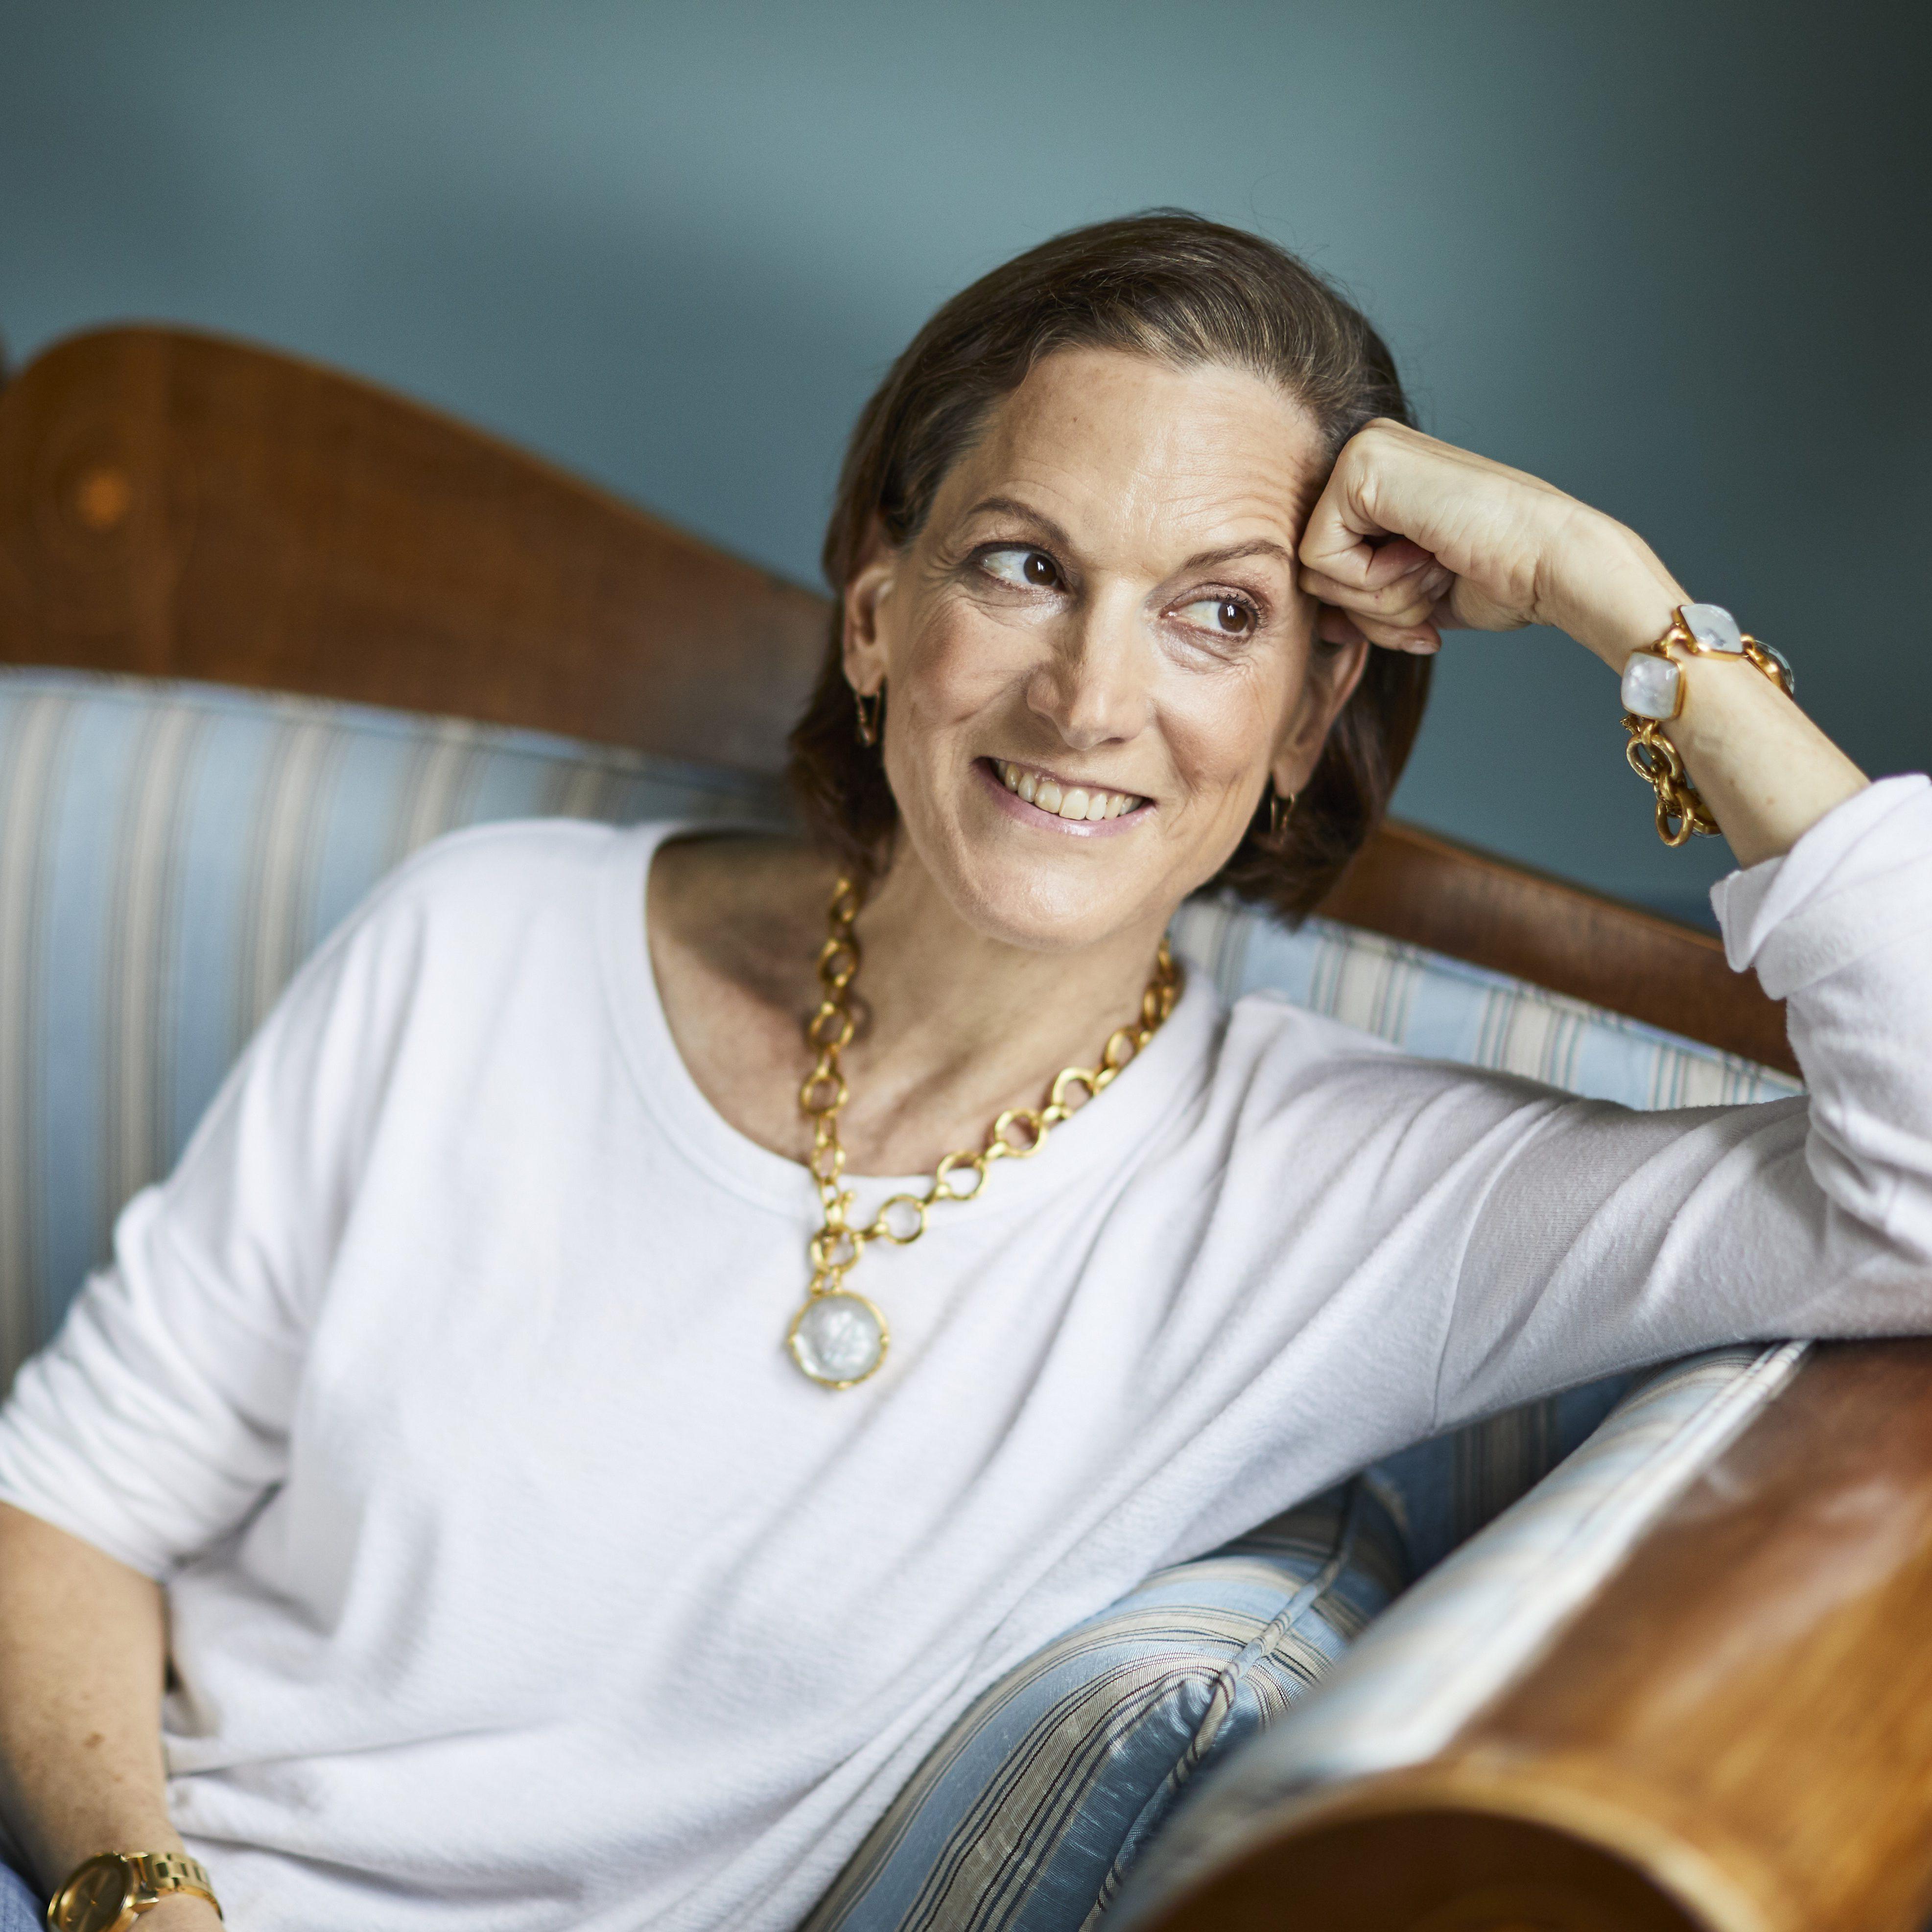 Biesiada Literacka – Anne Applebaum